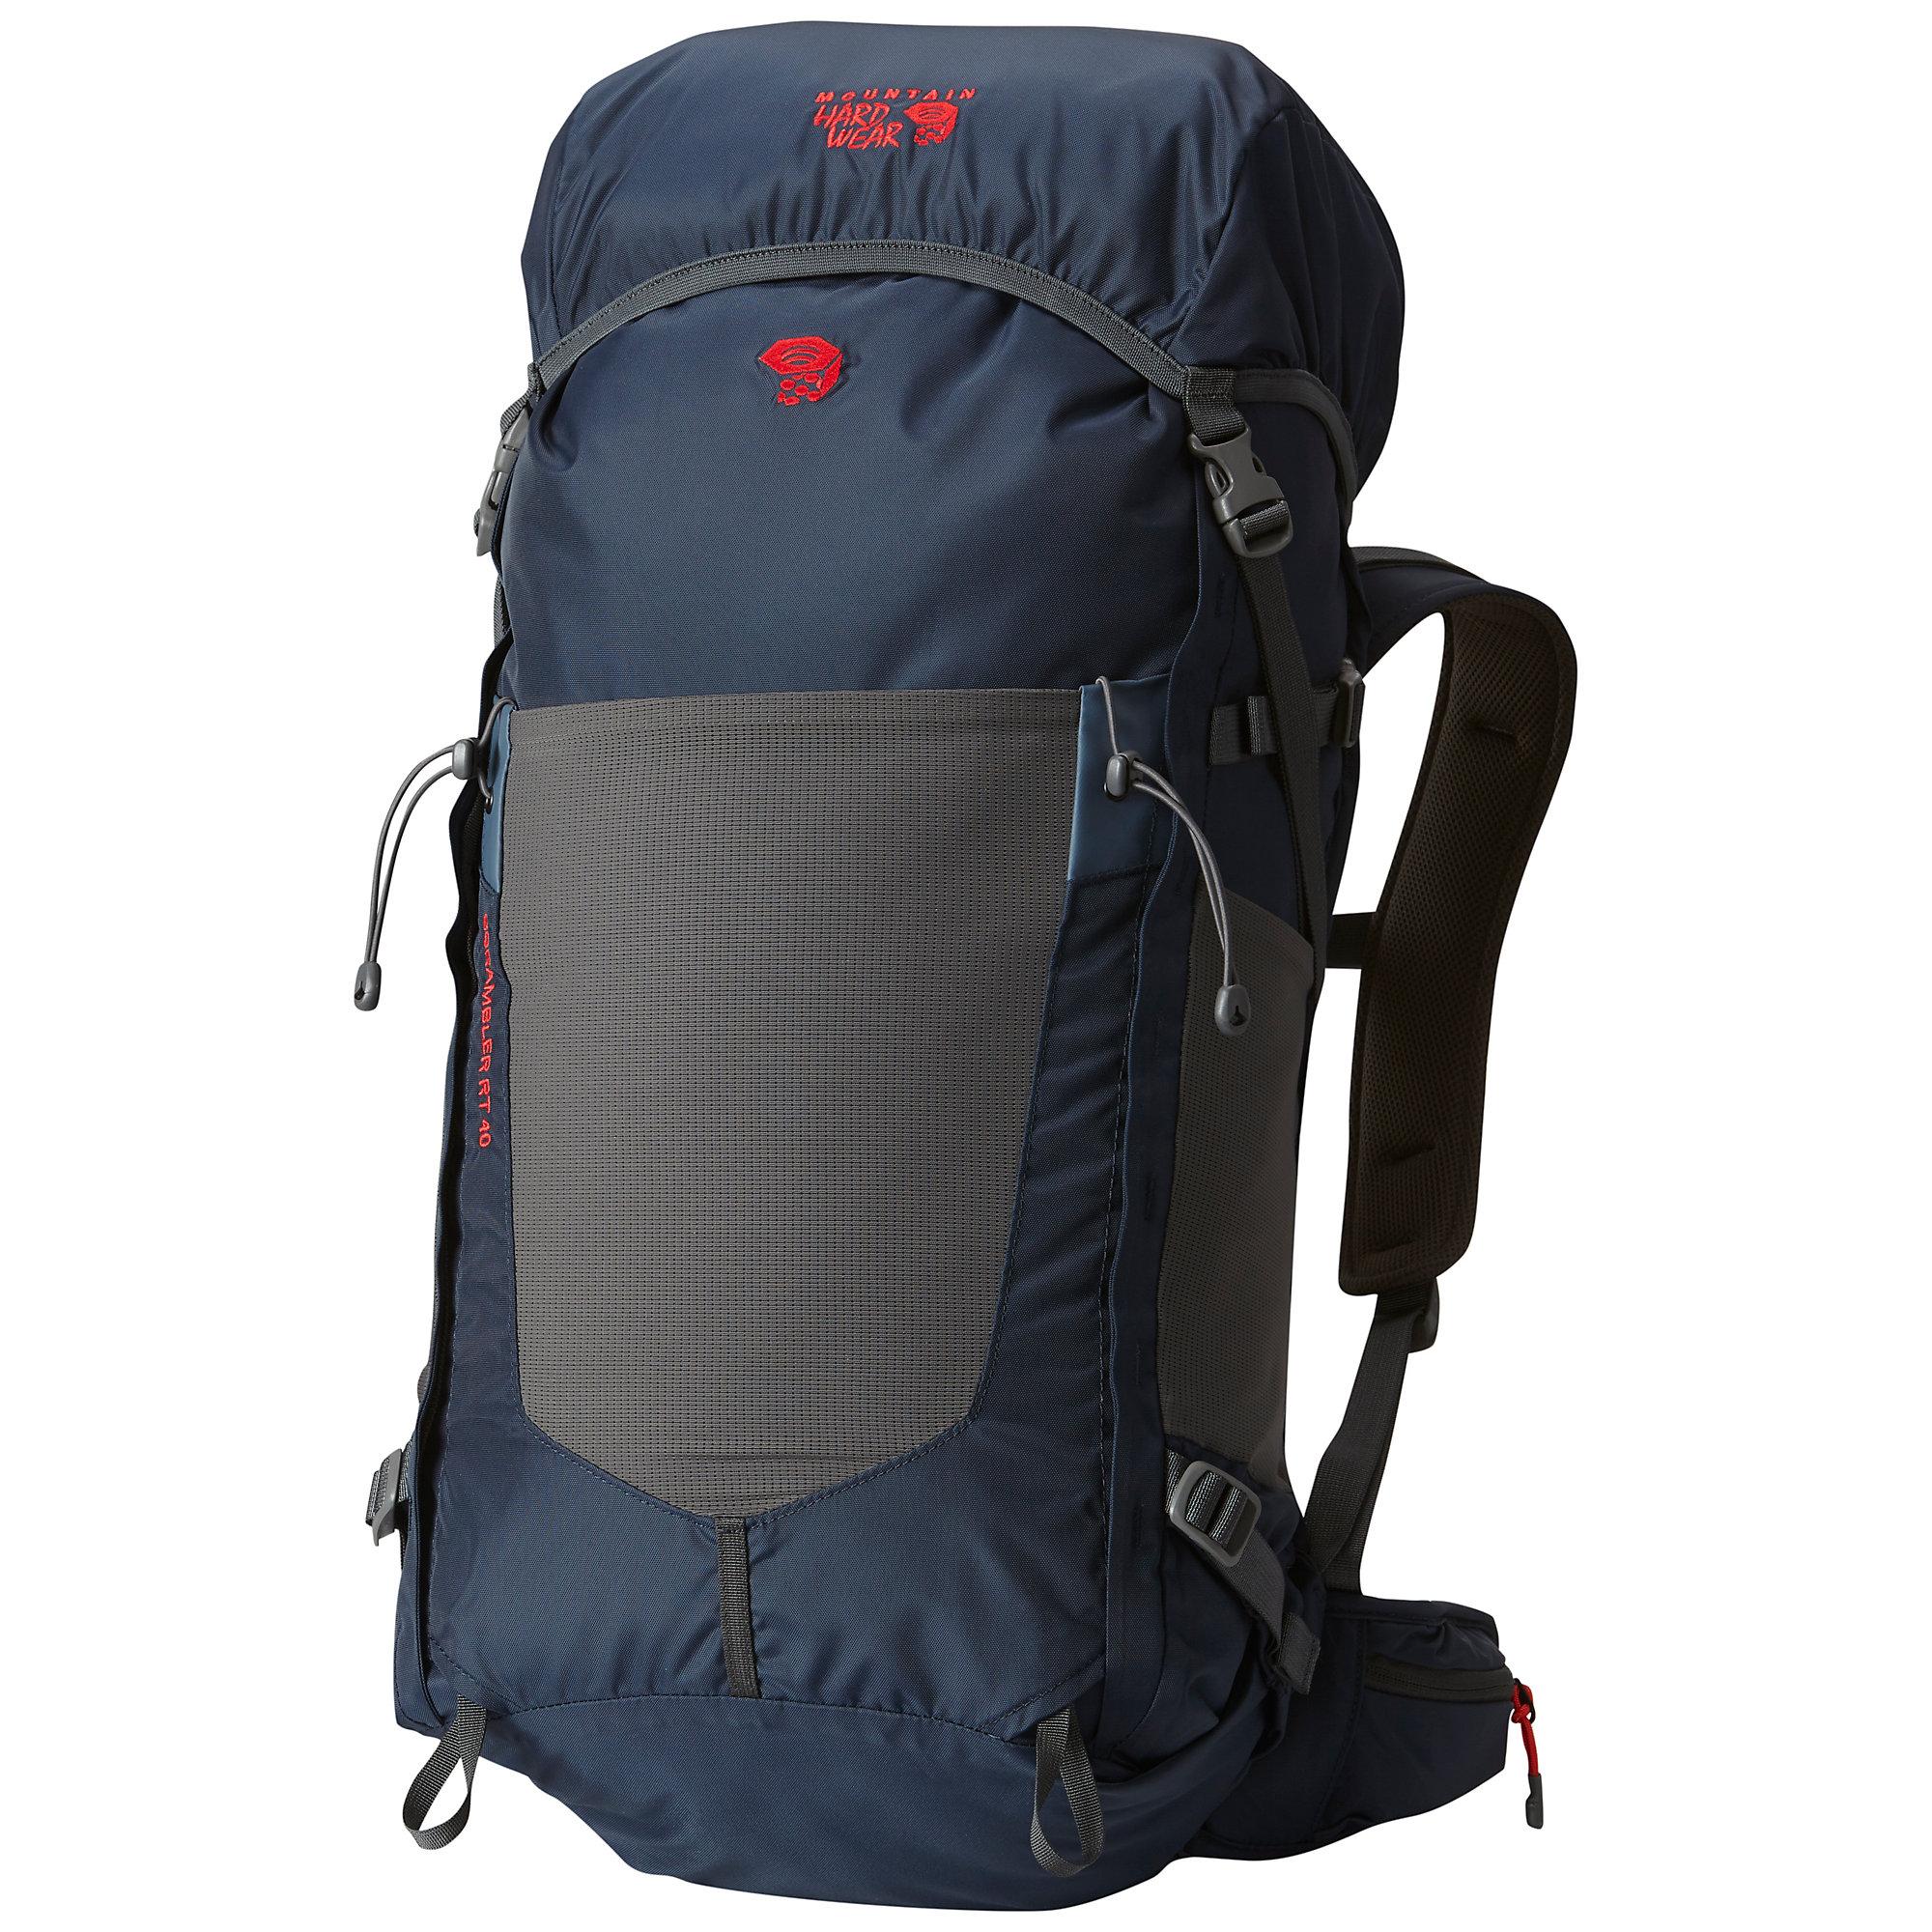 Mountain Hardwear Scrambler RT 40 OutDry